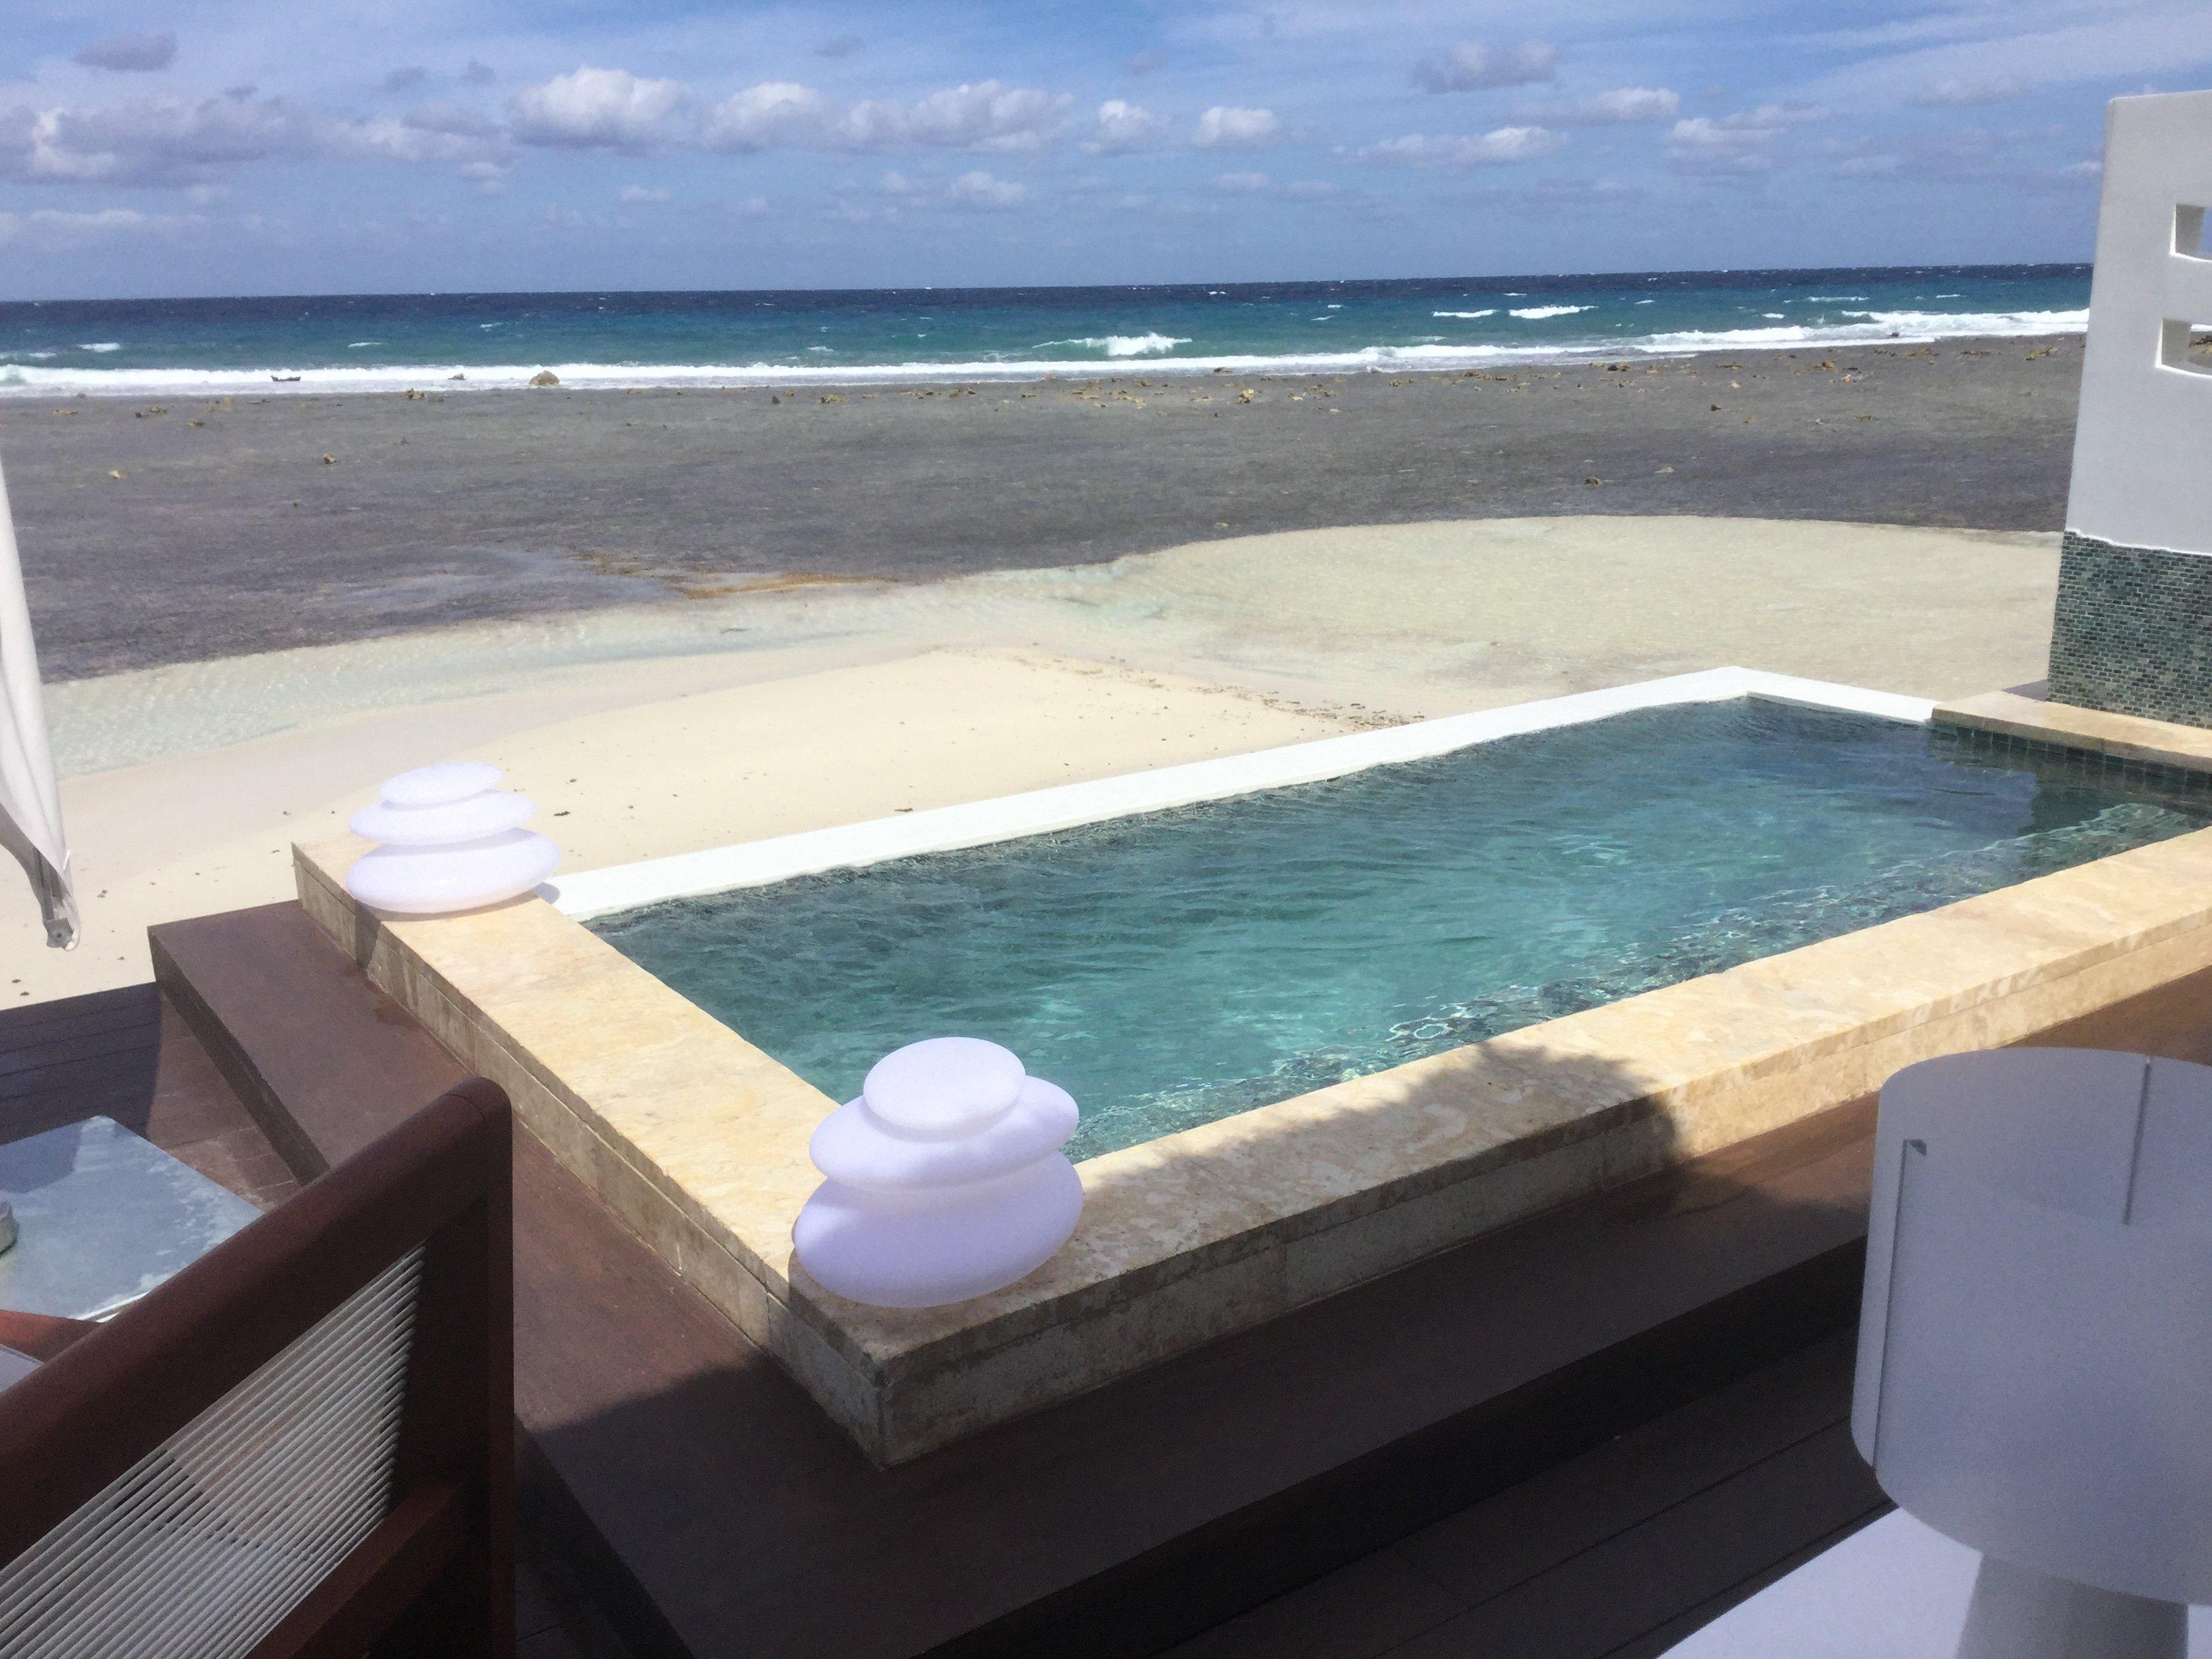 Sandals Royal Caribbean Resort Beach View